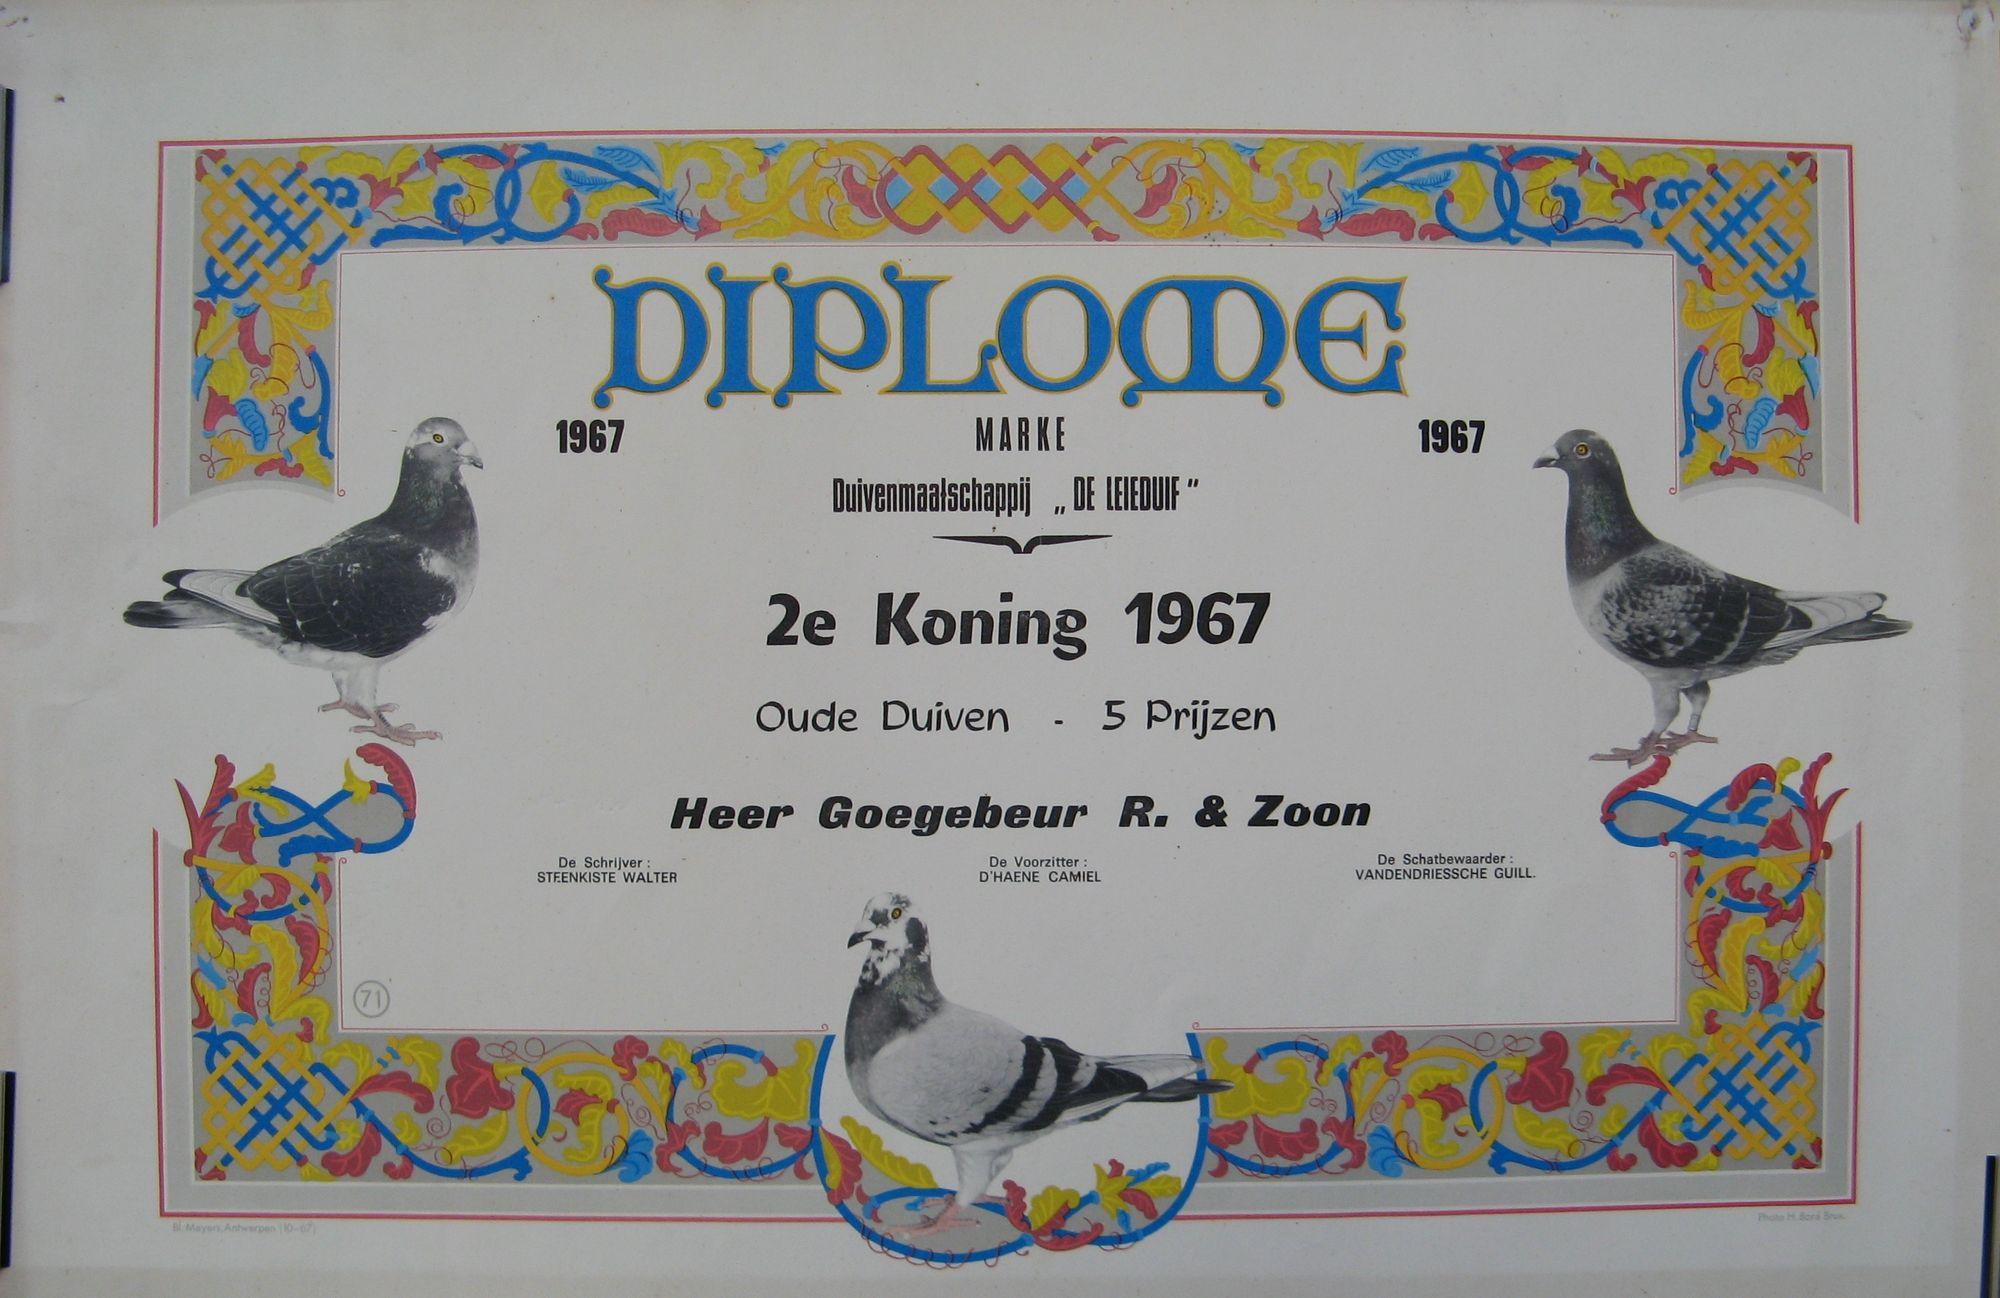 Diploma duivensport